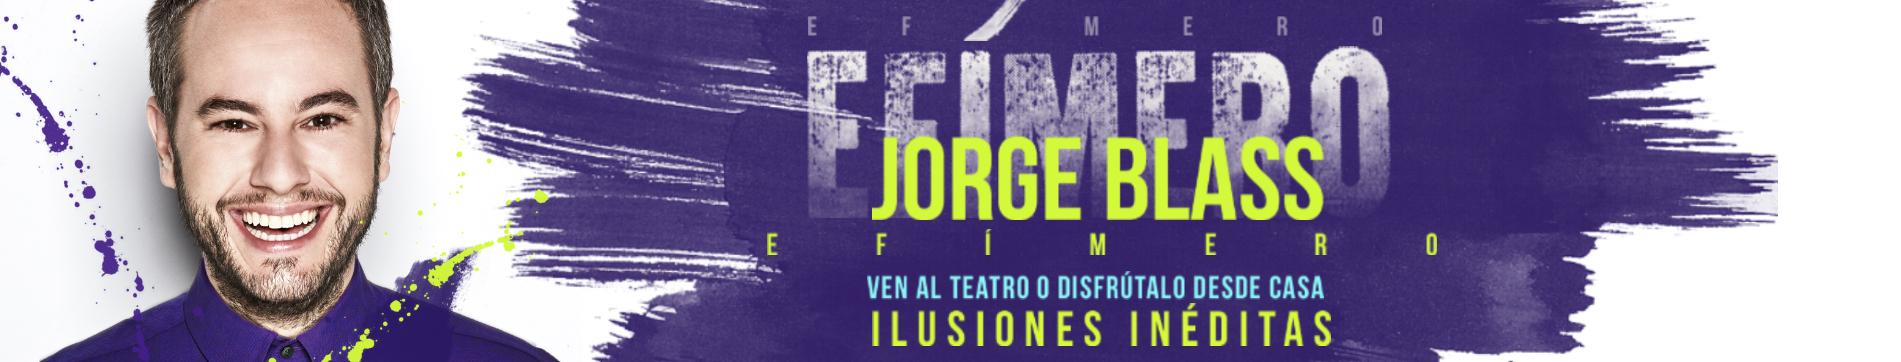 Jorge Blass, Efímero Live